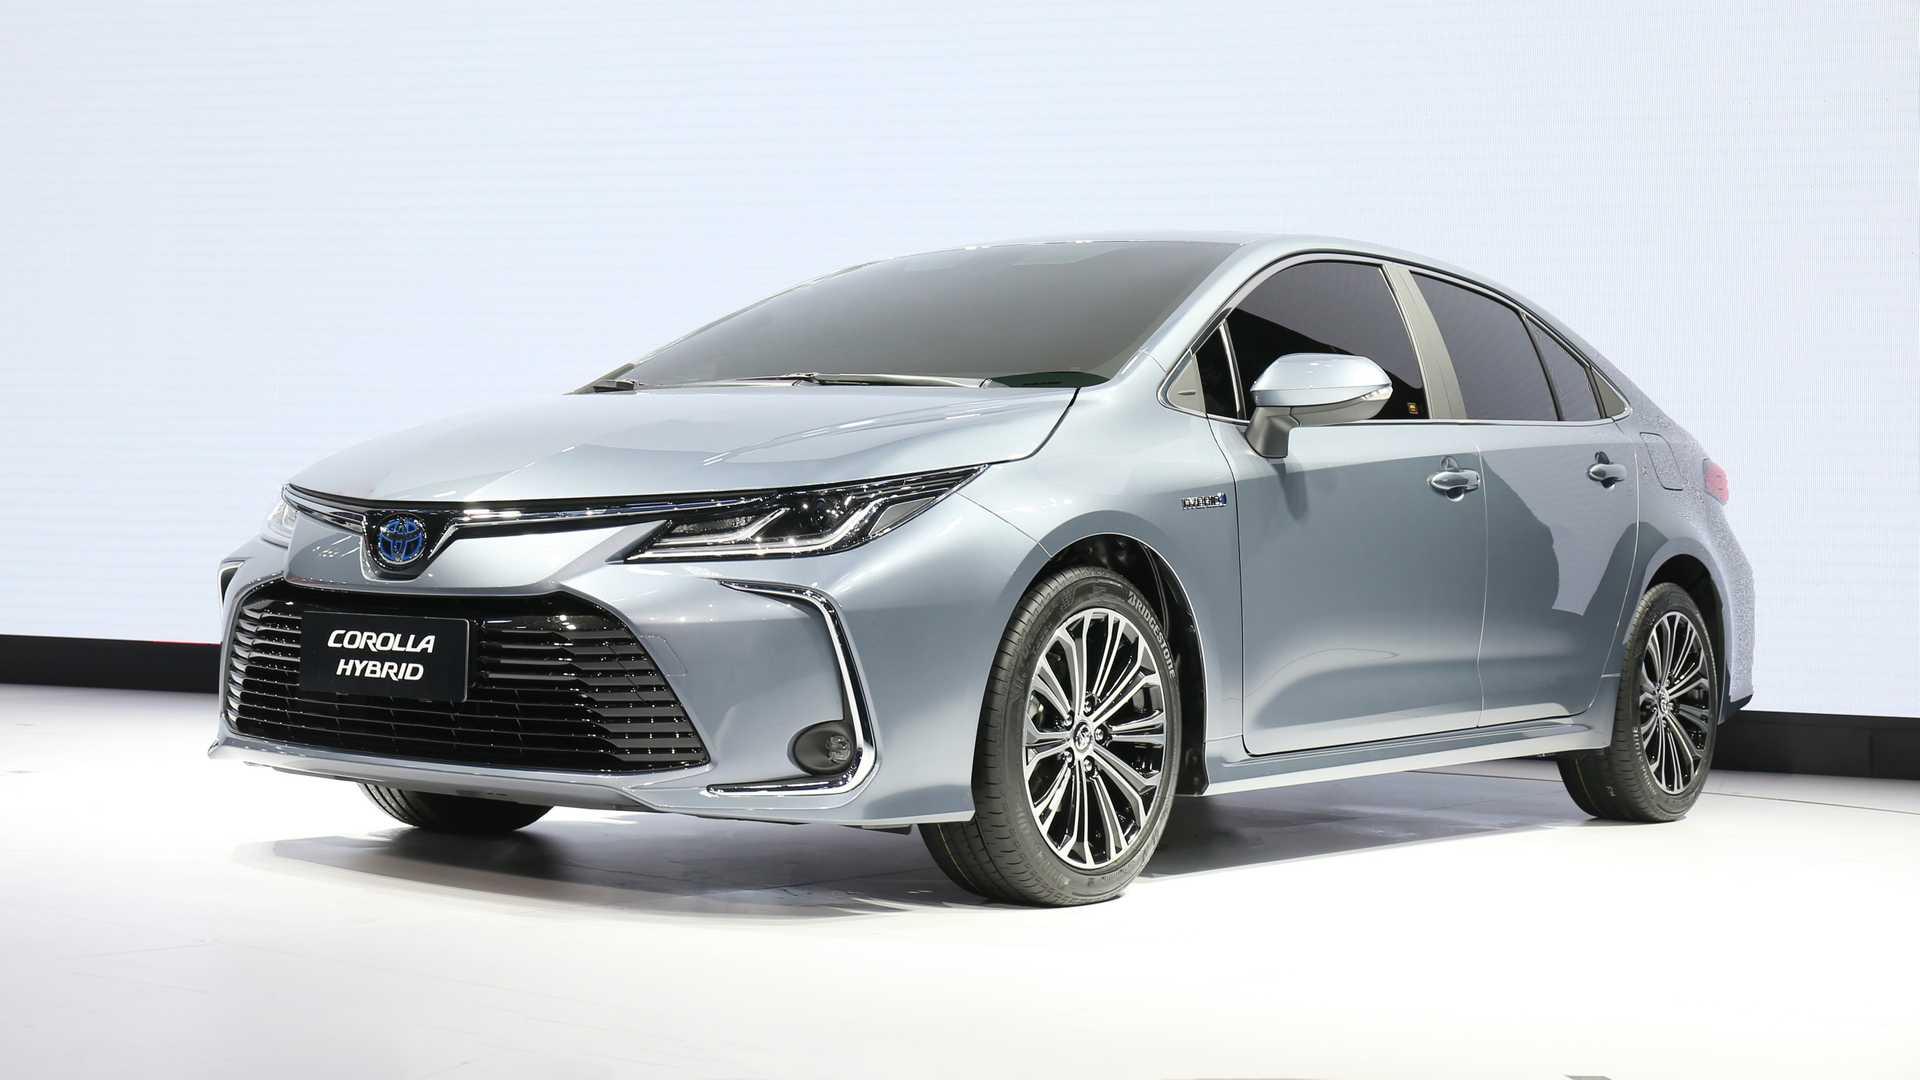 52 New Toyota 2020 Se Specs for Toyota 2020 Se